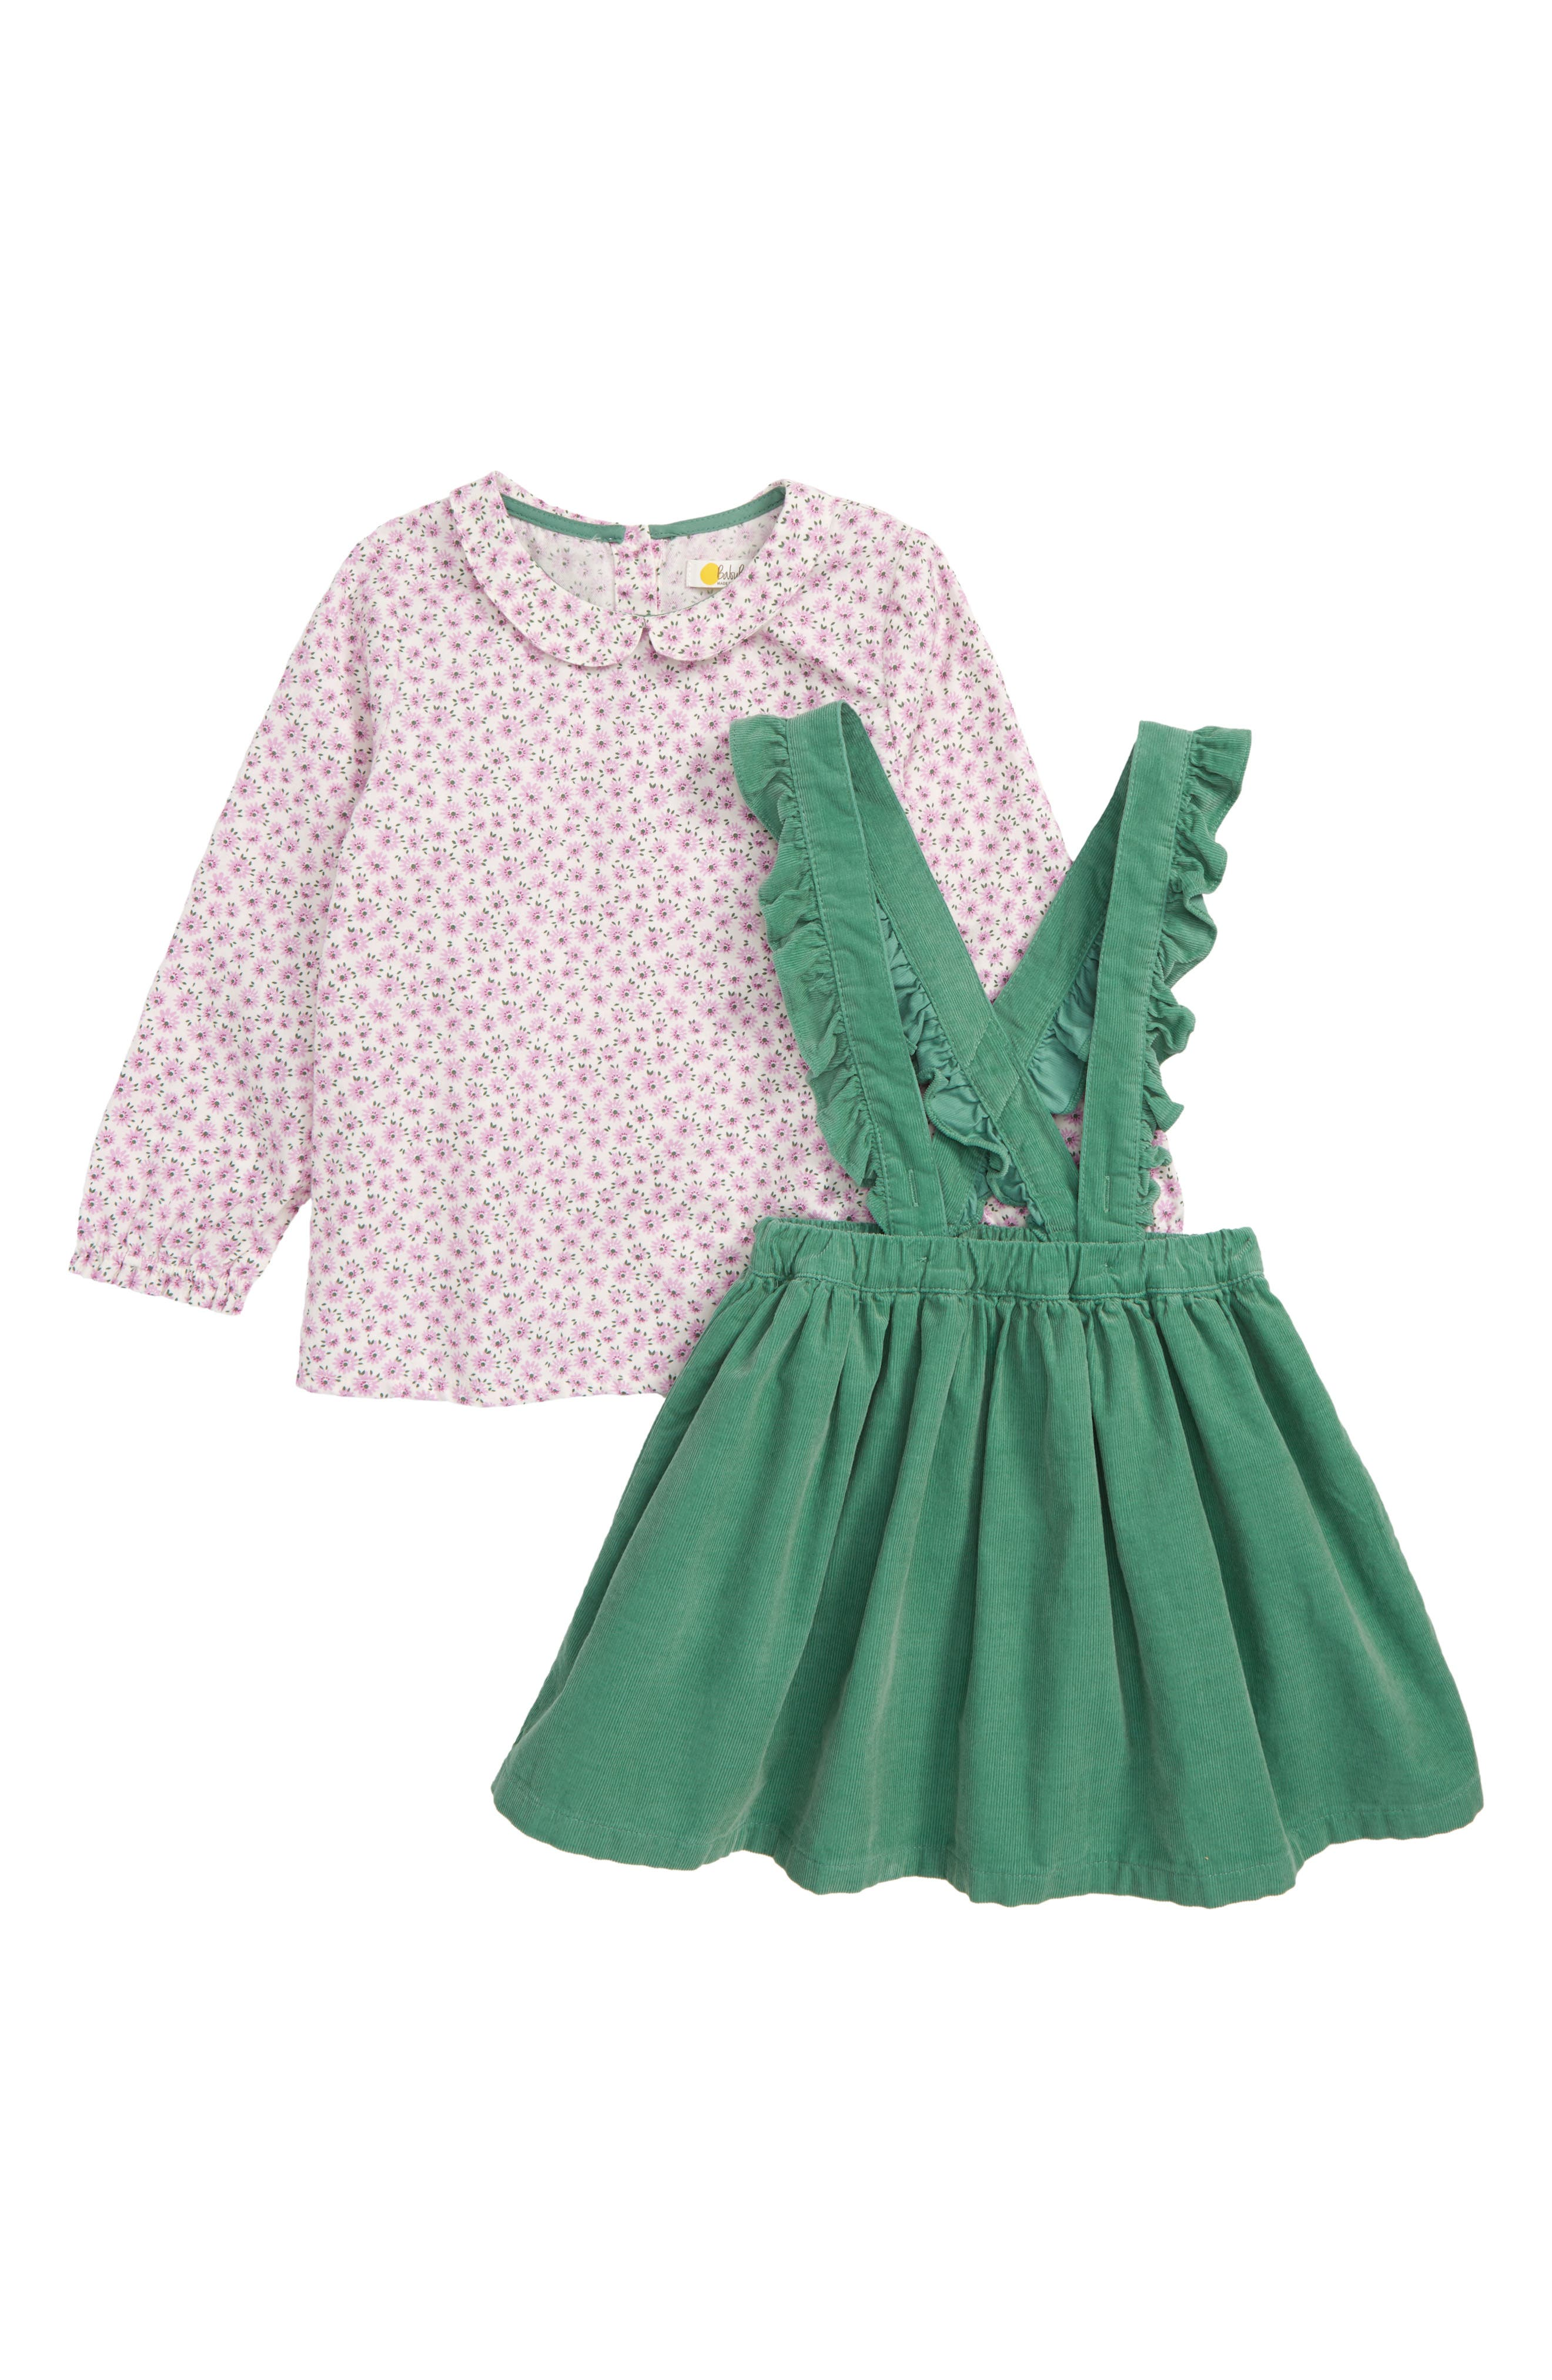 MINI BODEN, Nostalgic Print Top & Overall Skirt, Main thumbnail 1, color, 514